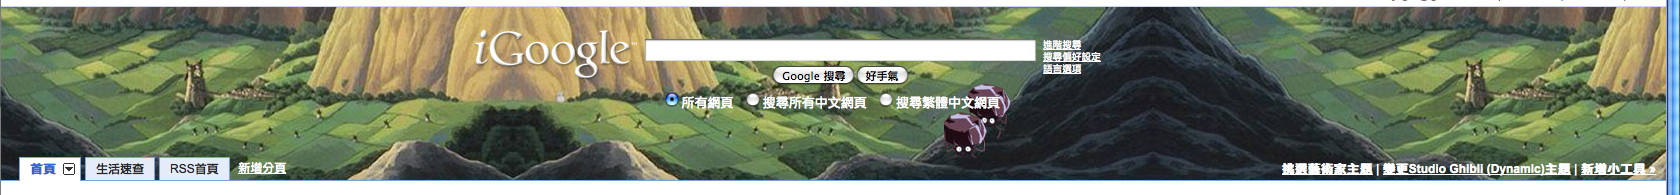 igoogle003.jpg